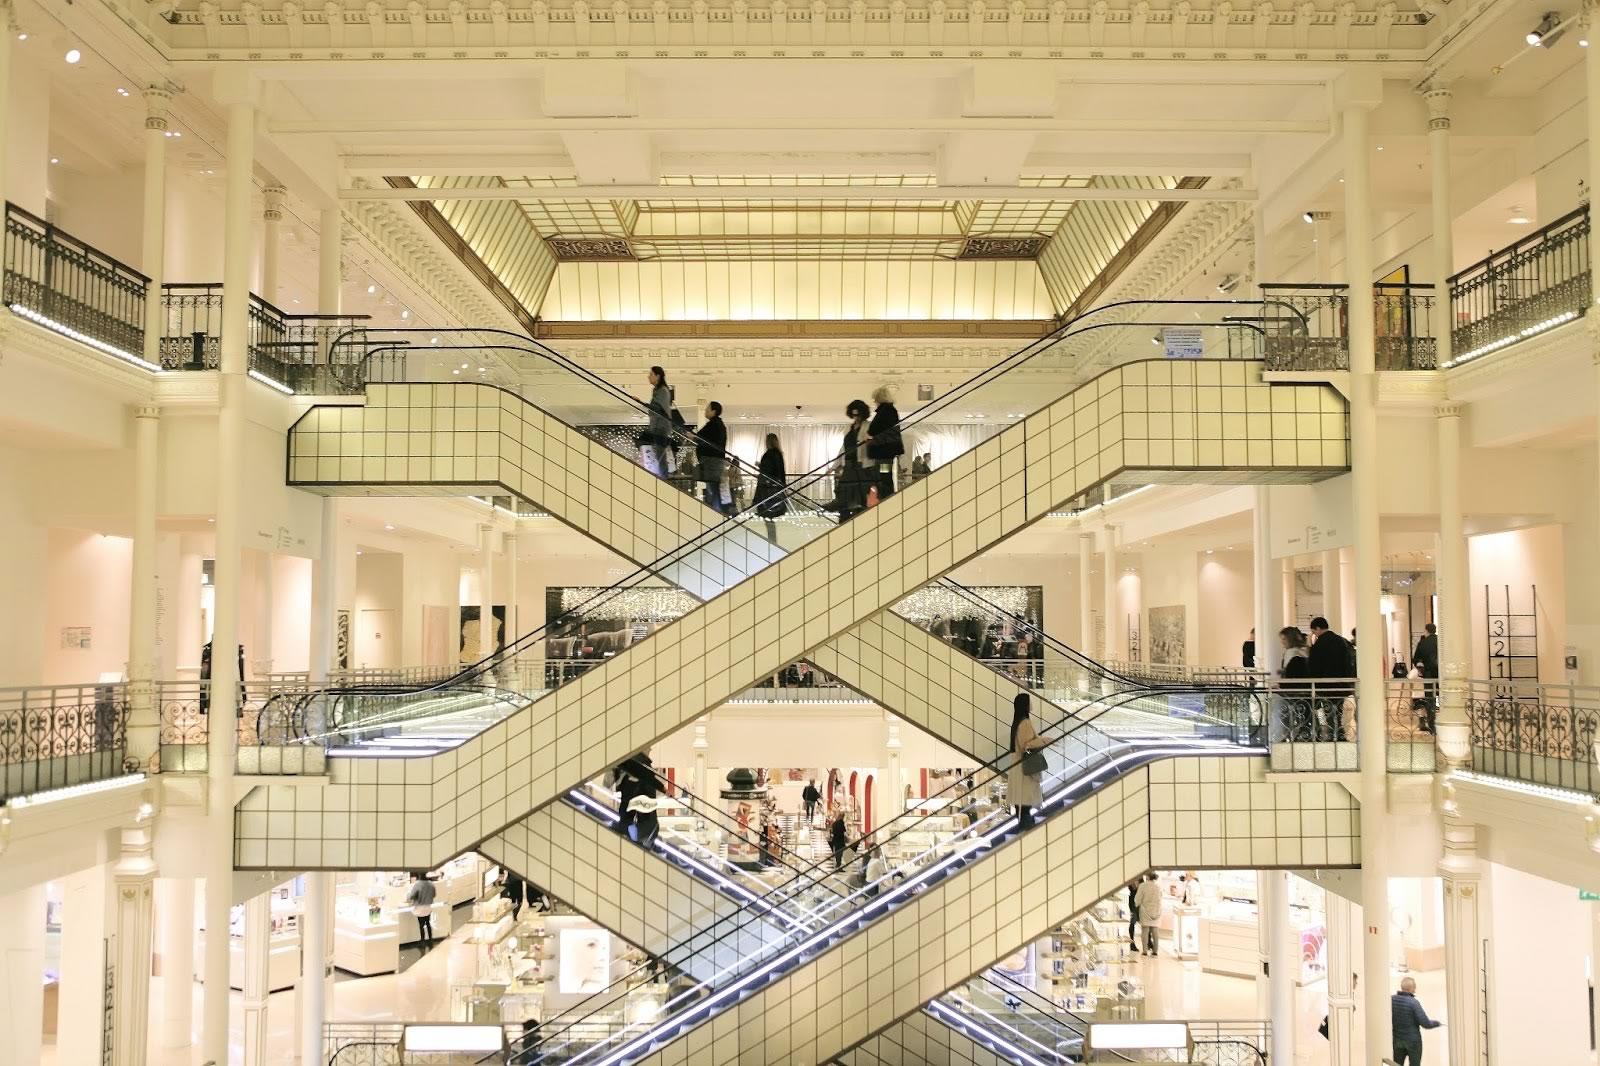 Détaxe na França: Saiba como pedir reembolso das suas compras